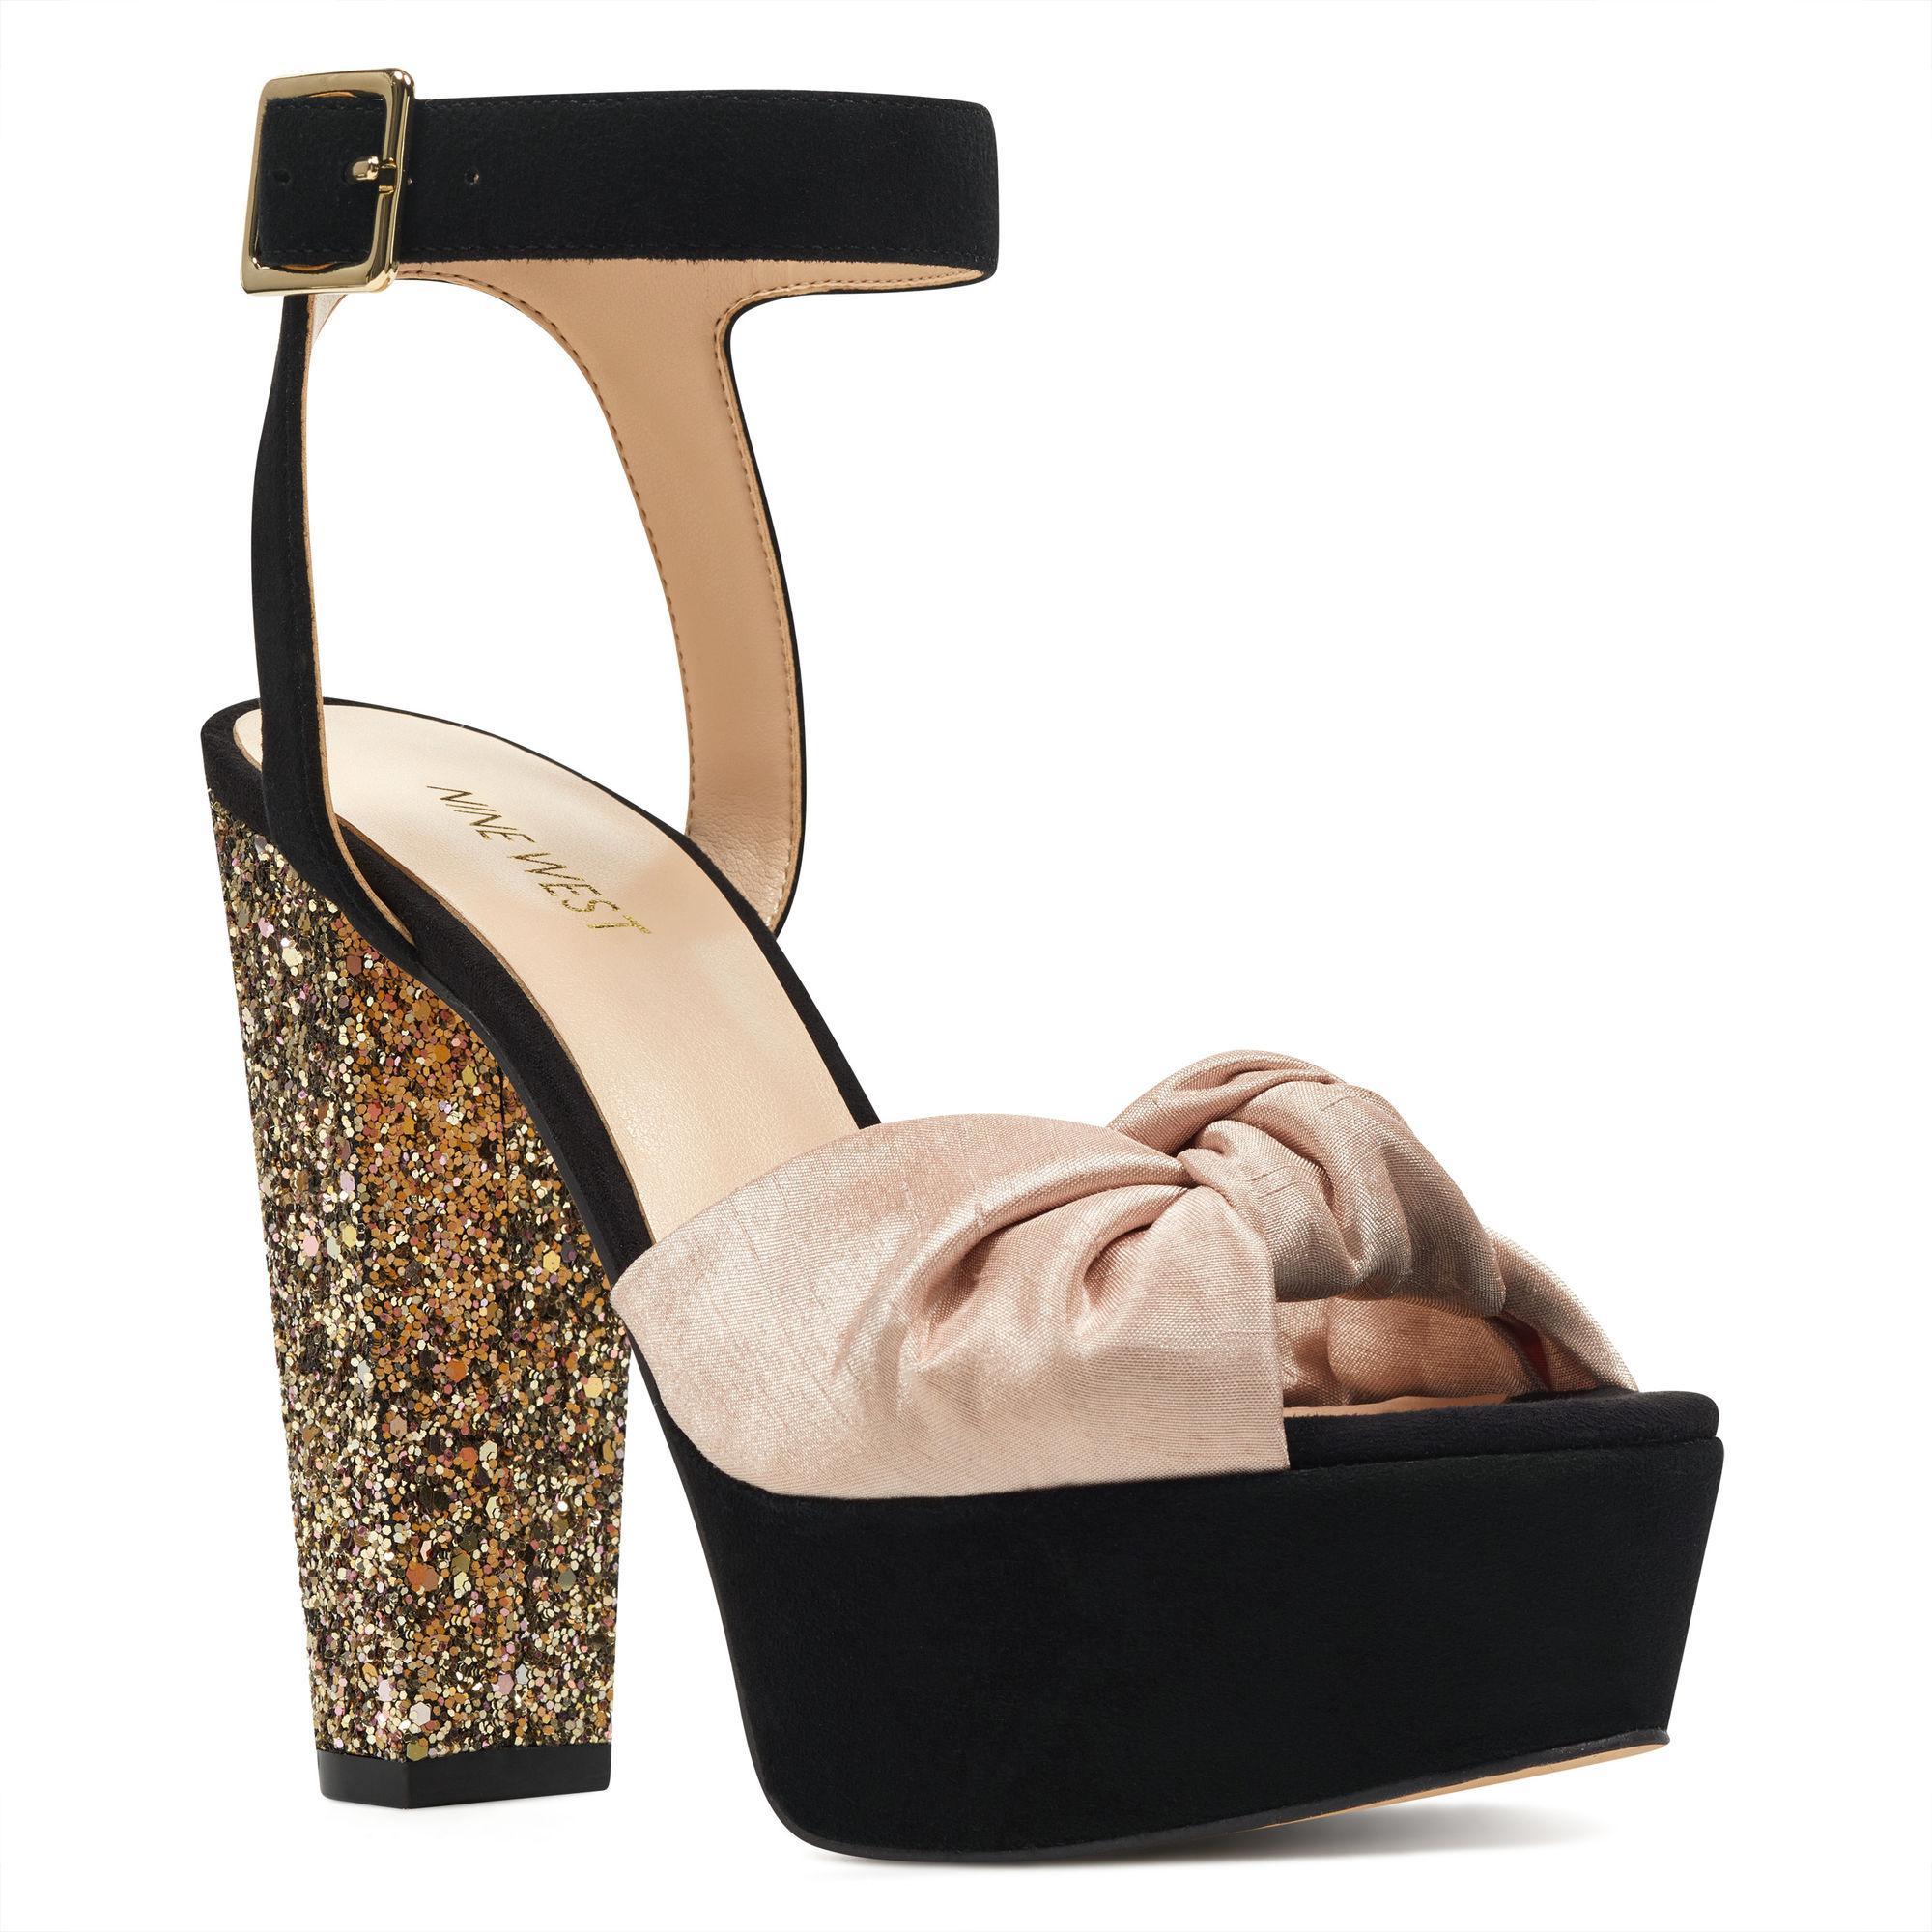 7f58a1fb59da Lyst - Nine West Cuverma Ankle Strap Sandals